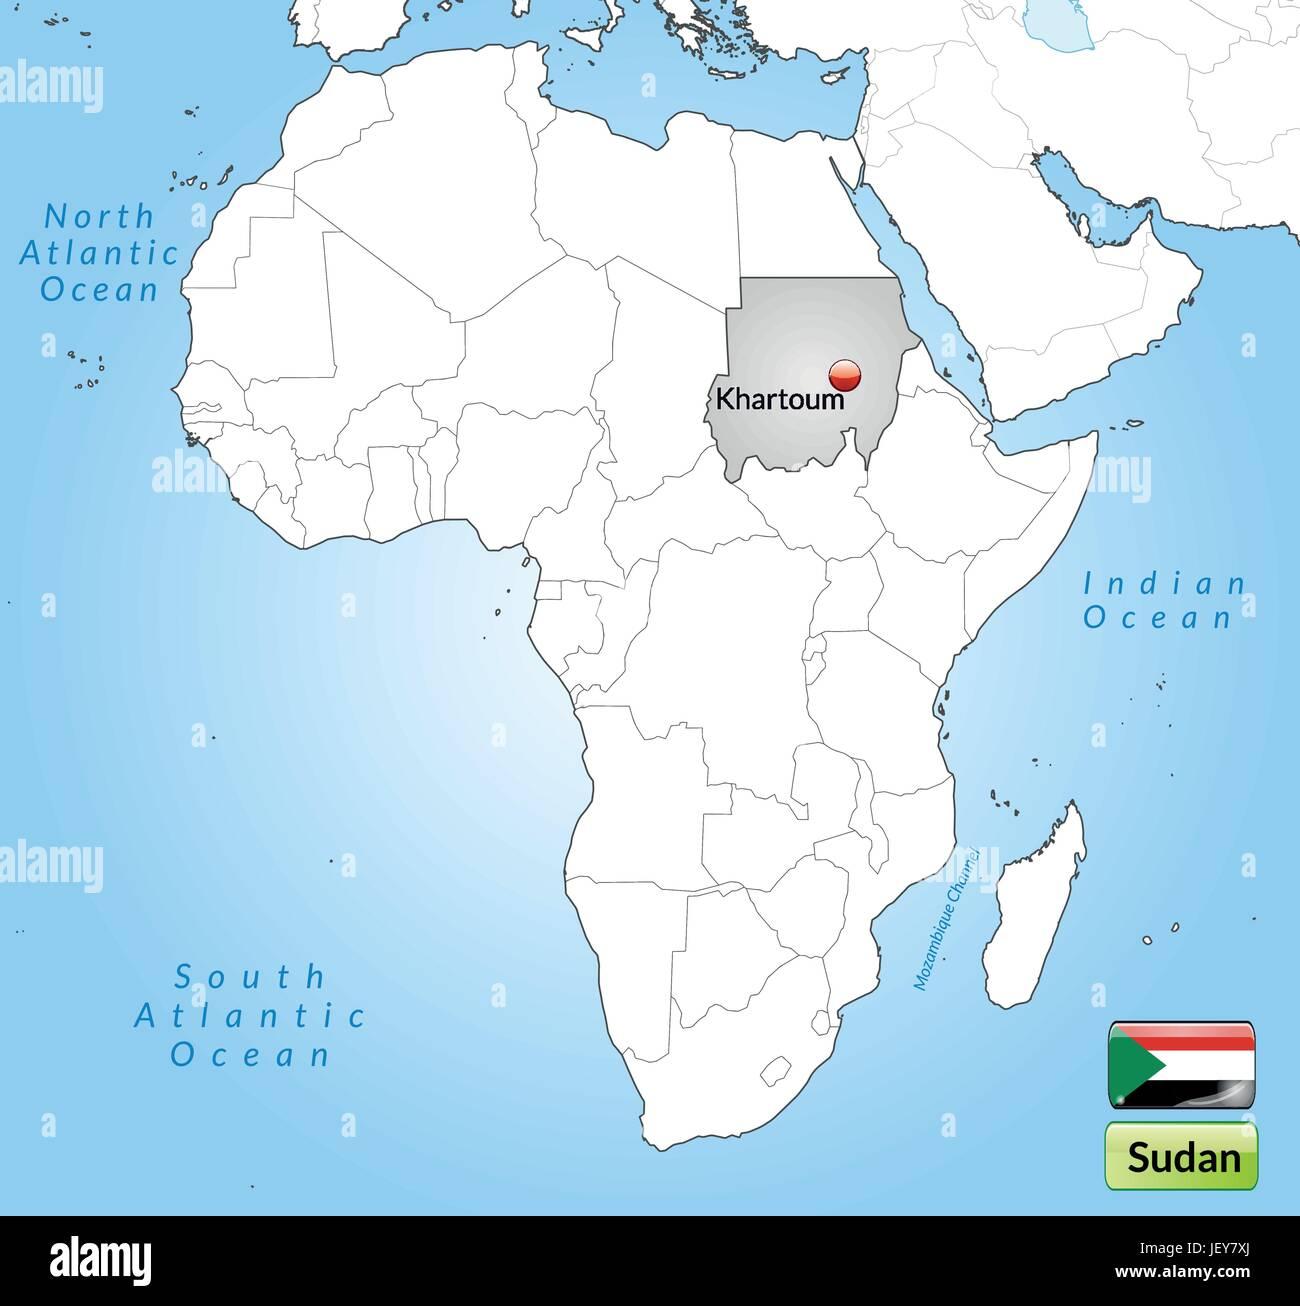 Map Of Sudan Stock Photos & Map Of Sudan Stock Images - Alamy Khartoum Location On World Map on barcelona location on world map, stockholm location on world map, red sea location on world map, united states location on world map, bangalore location on world map, warsaw location on world map, frankfurt location on world map, melbourne location on world map, athens location on world map, mogadishu location on world map, mexico city location on world map, vancouver location on world map, bogota location on world map, lagos location on world map, santo domingo location on world map, toronto location on world map, santiago location on world map, hong kong location on world map, brussels location on world map, auckland location on world map,